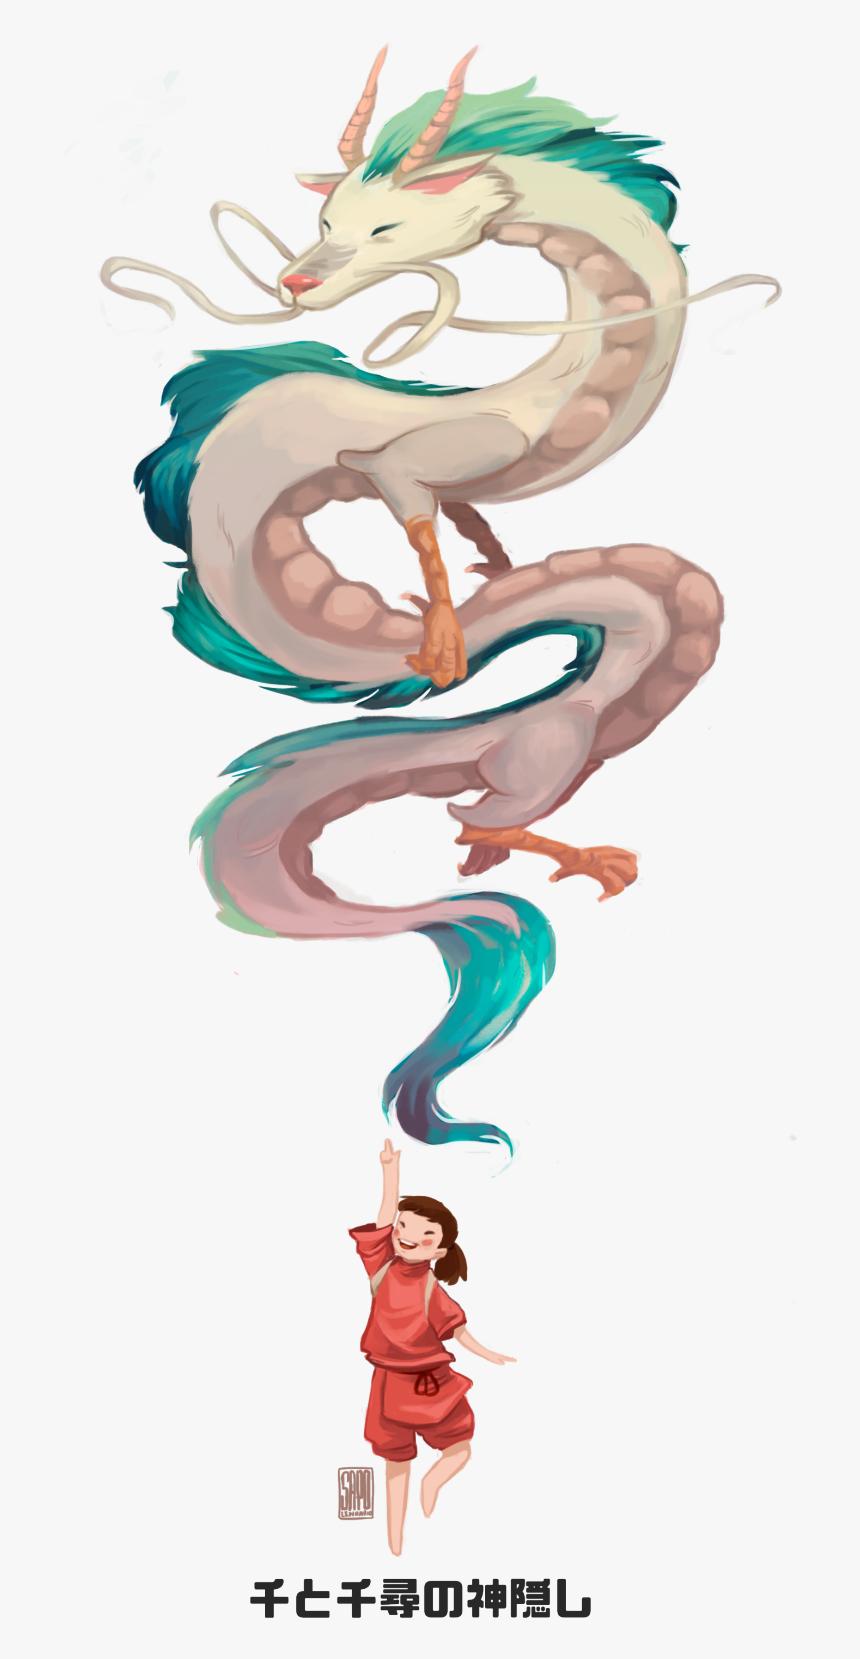 Spirited Away Dragon Transparent Hd Png Download Transparent Png Image Pngitem